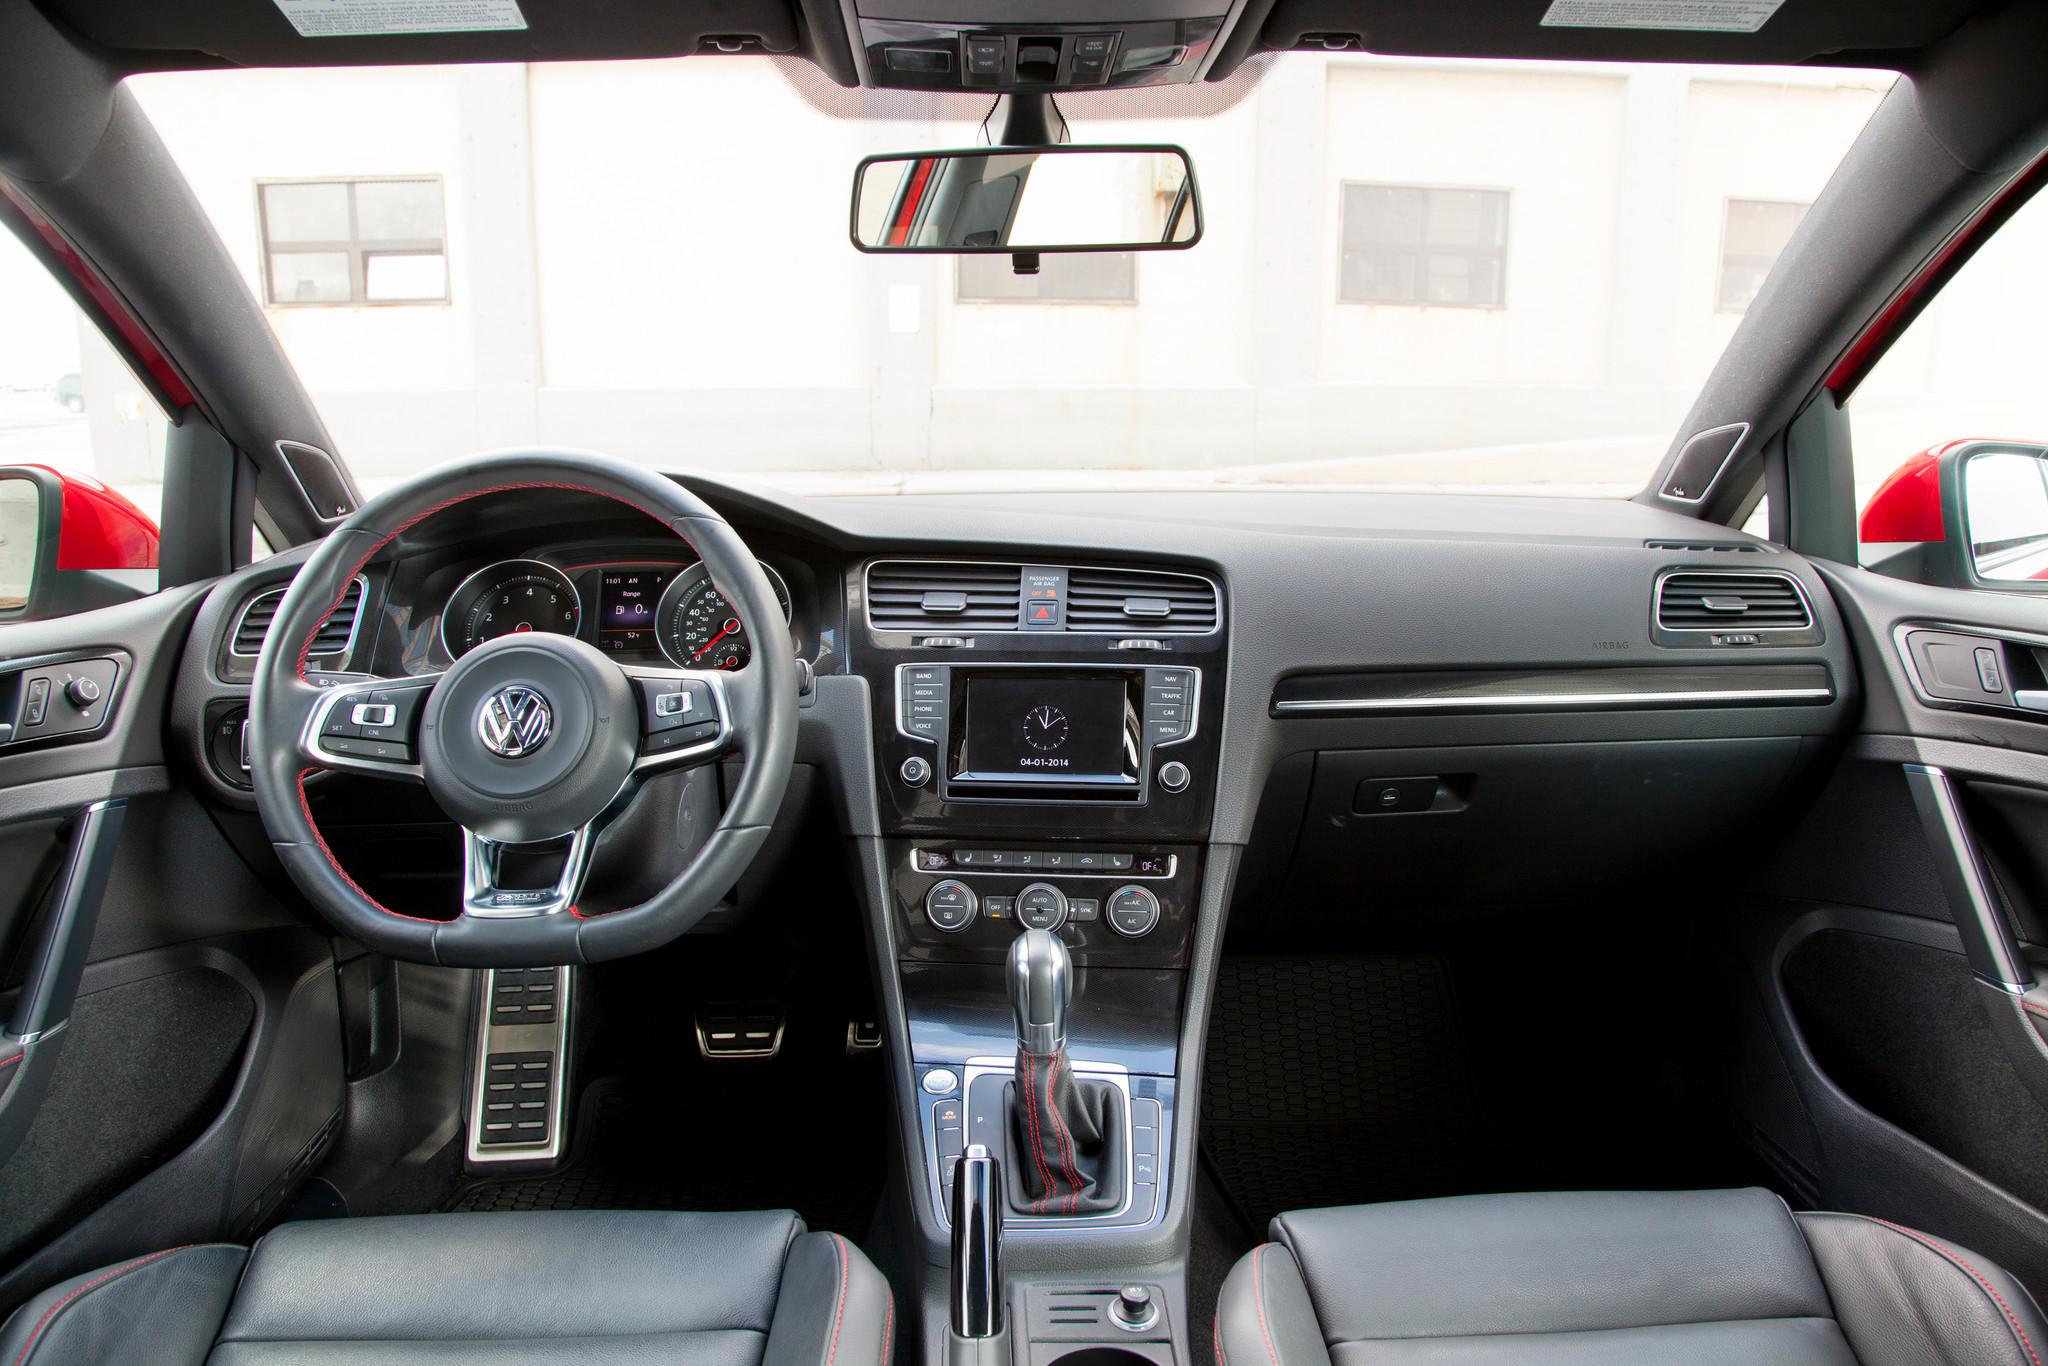 2015 Volkswagen Golf improves on winning hatchback style